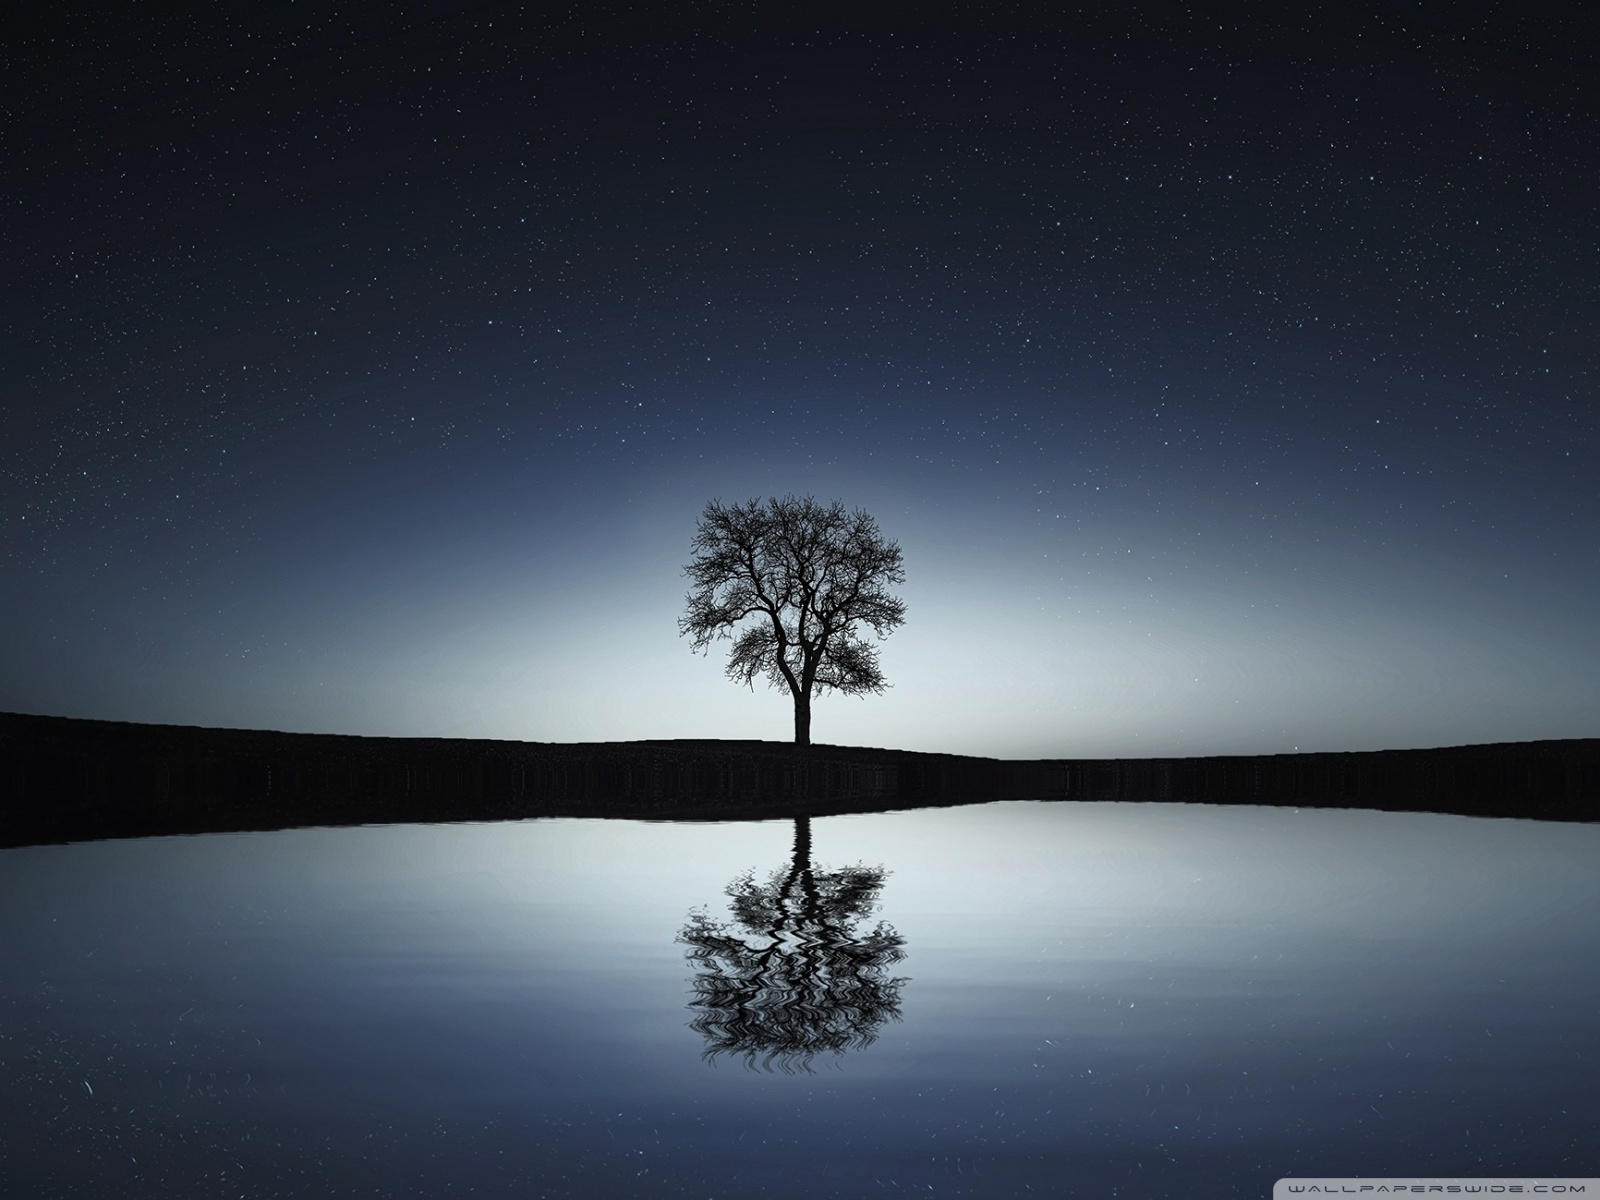 Free Bare Tree, Winter Night phone wallpaper by moonbunni87